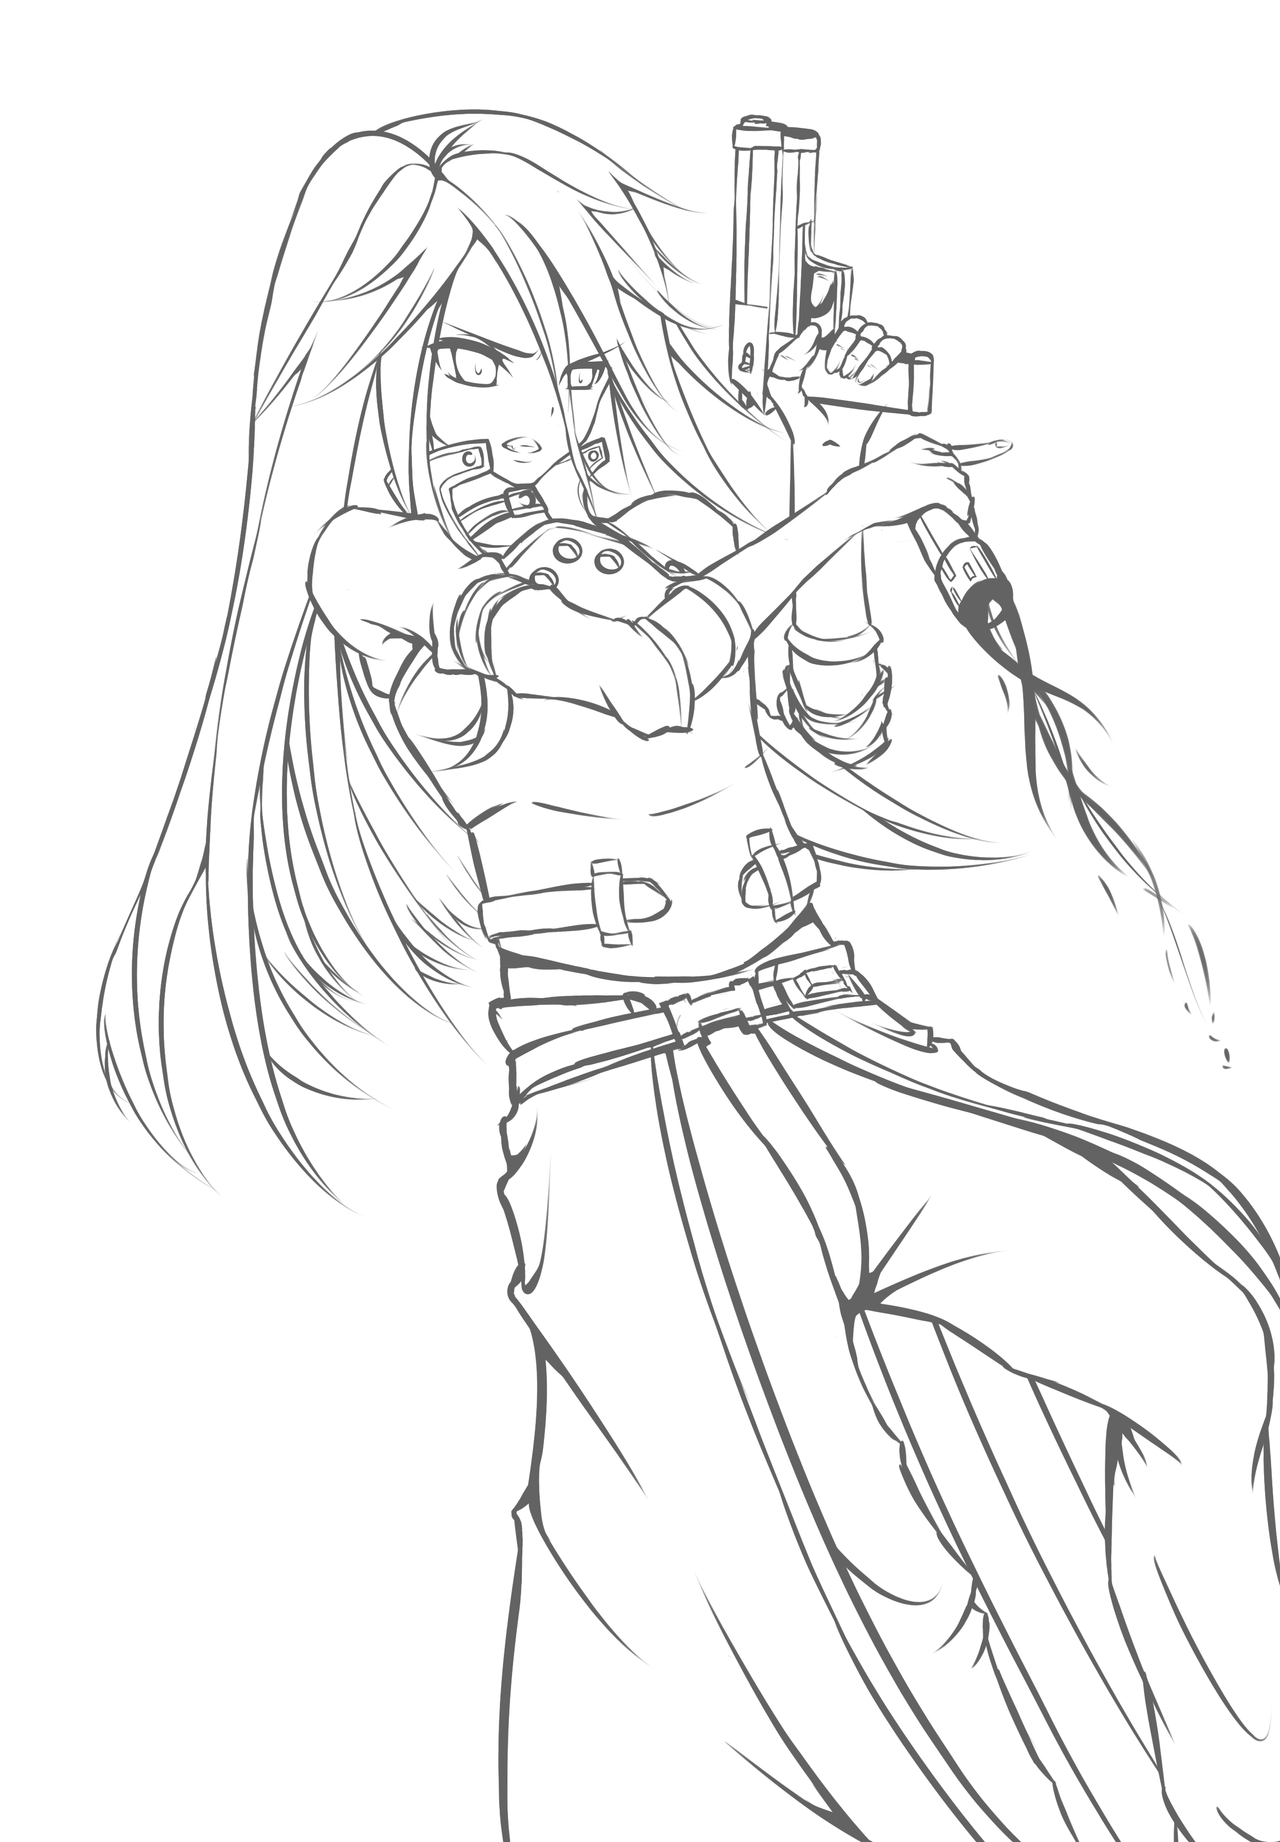 Lineart Ggo Kirito Remastered By Kayuu Kun On Deviantart